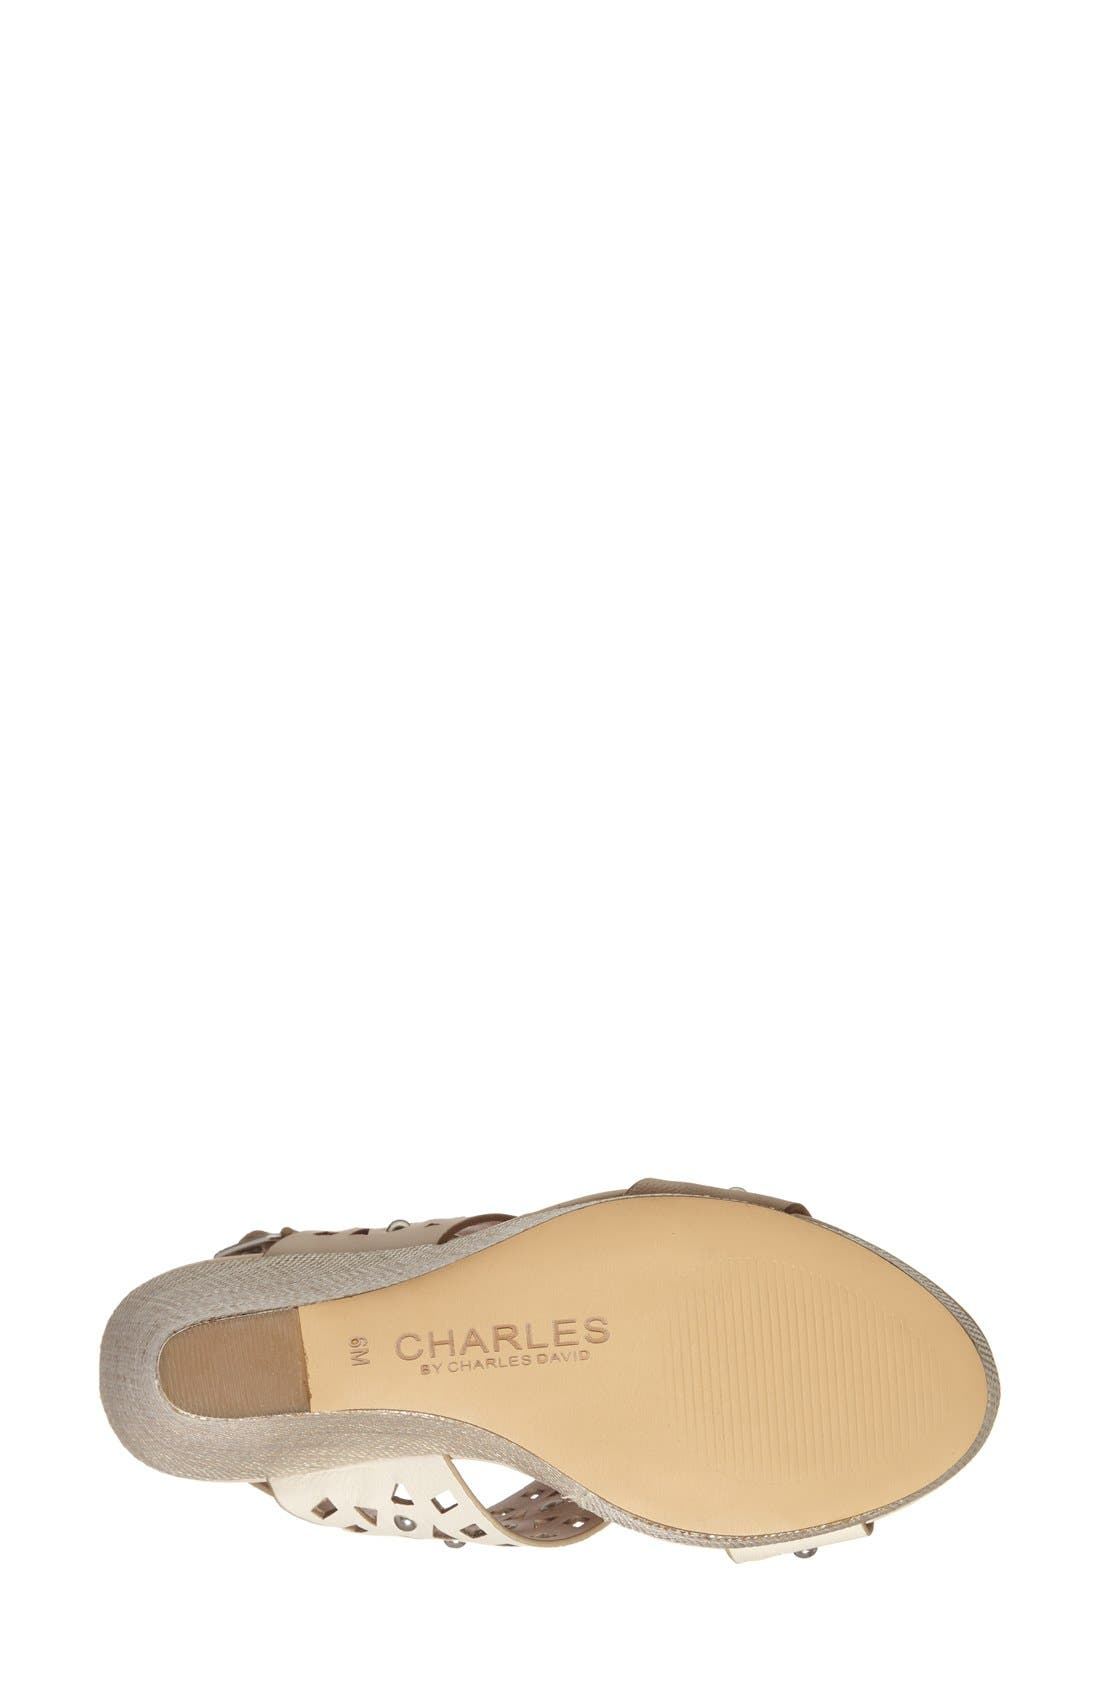 Alternate Image 4  - Charles by Charles David 'Aloof' Wedge Sandal (Women)